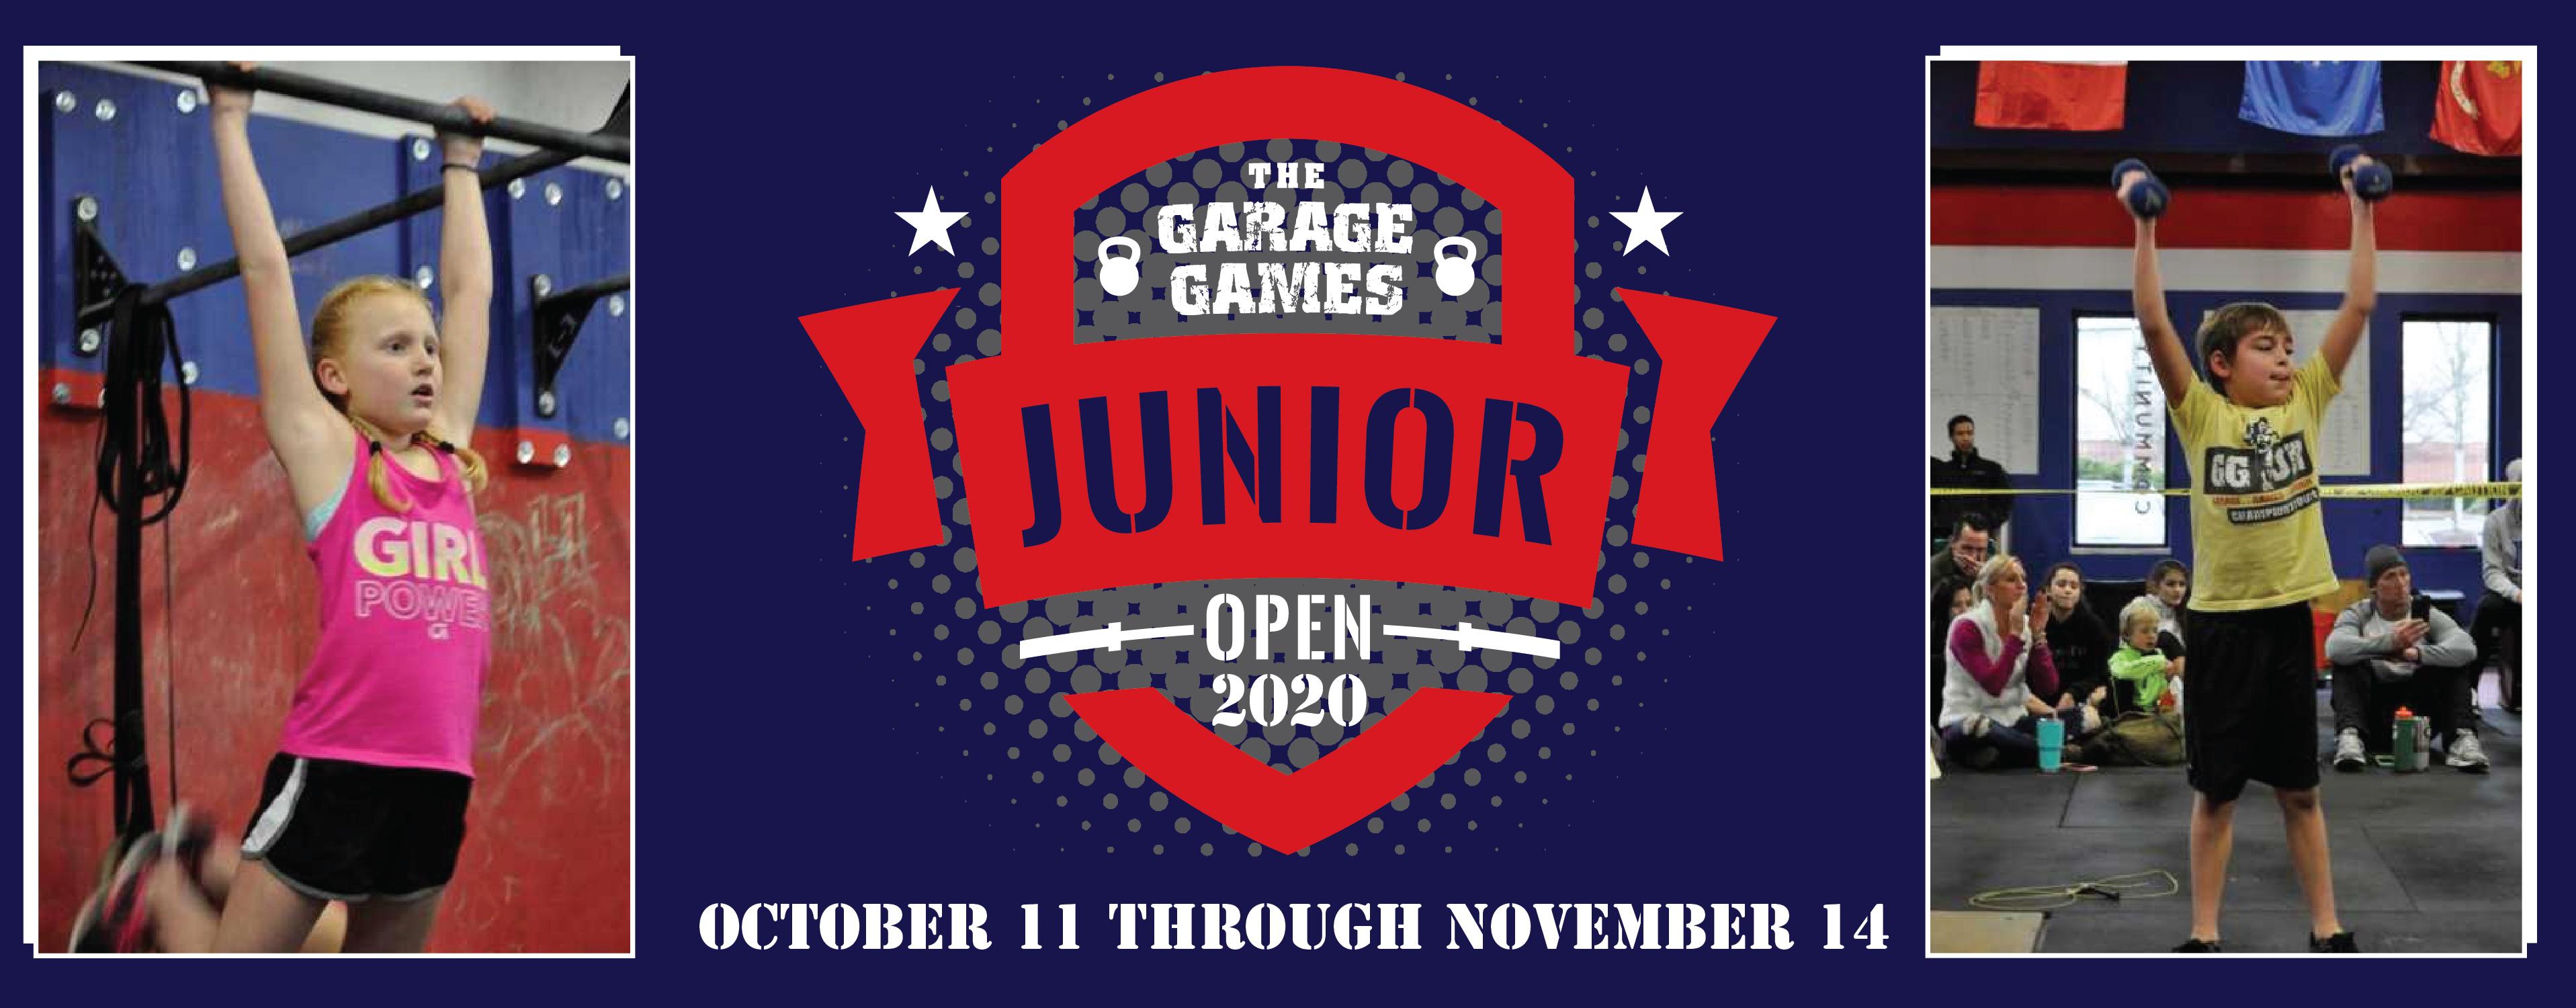 Festivus Games 2020.Festivus Games The Garage The Garage Games Series